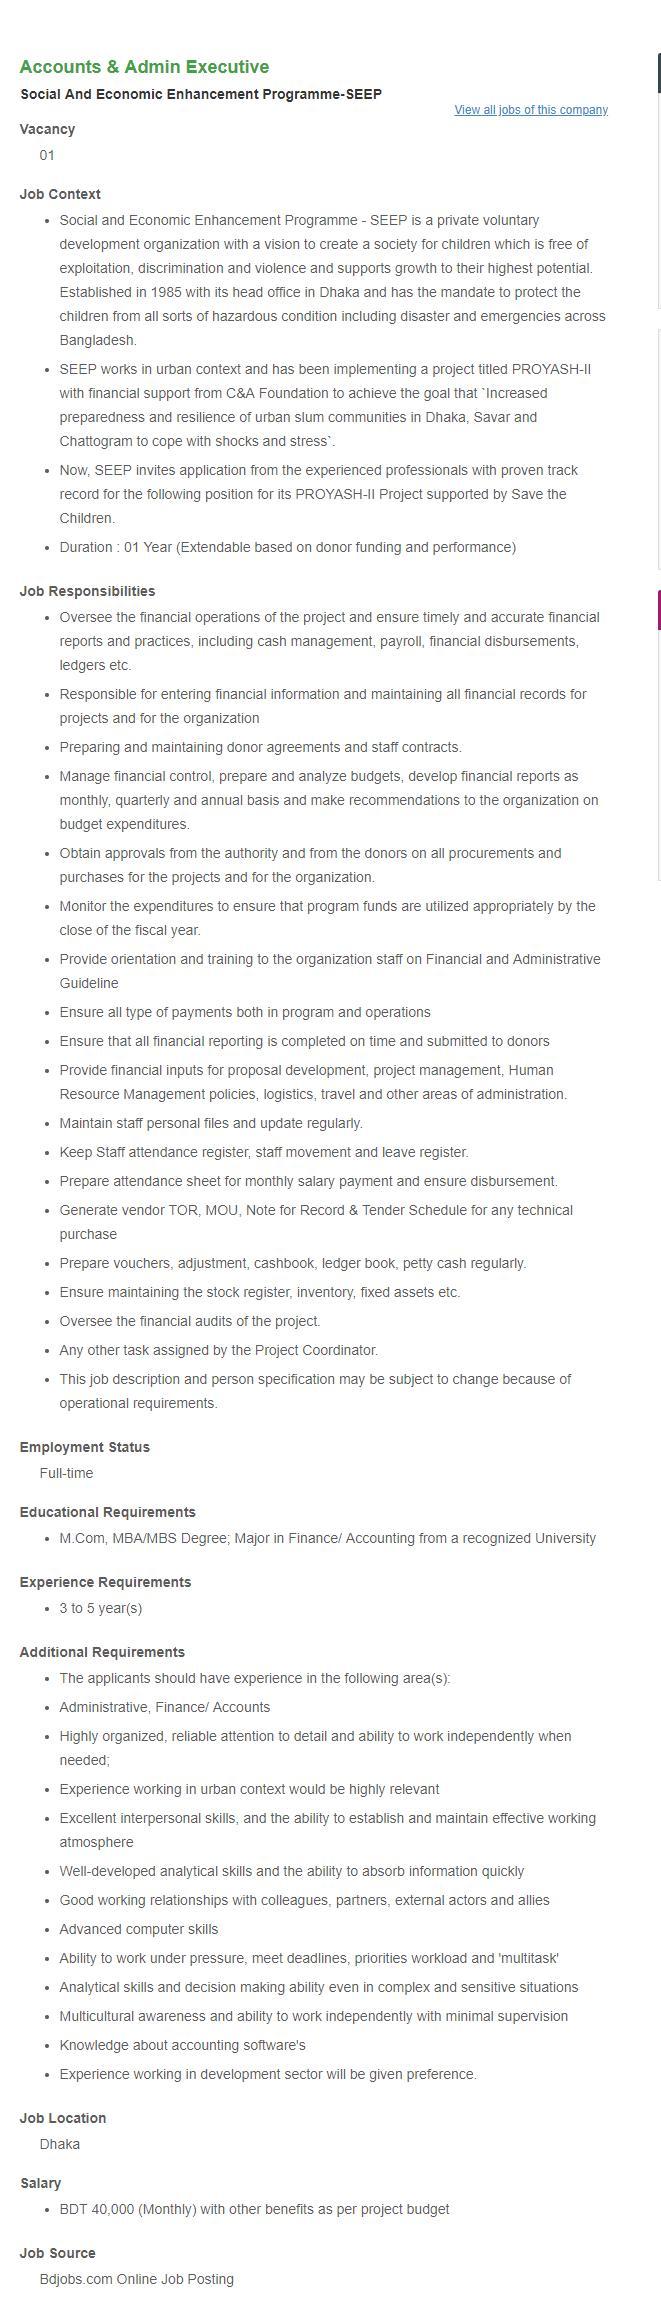 SEEP job circular